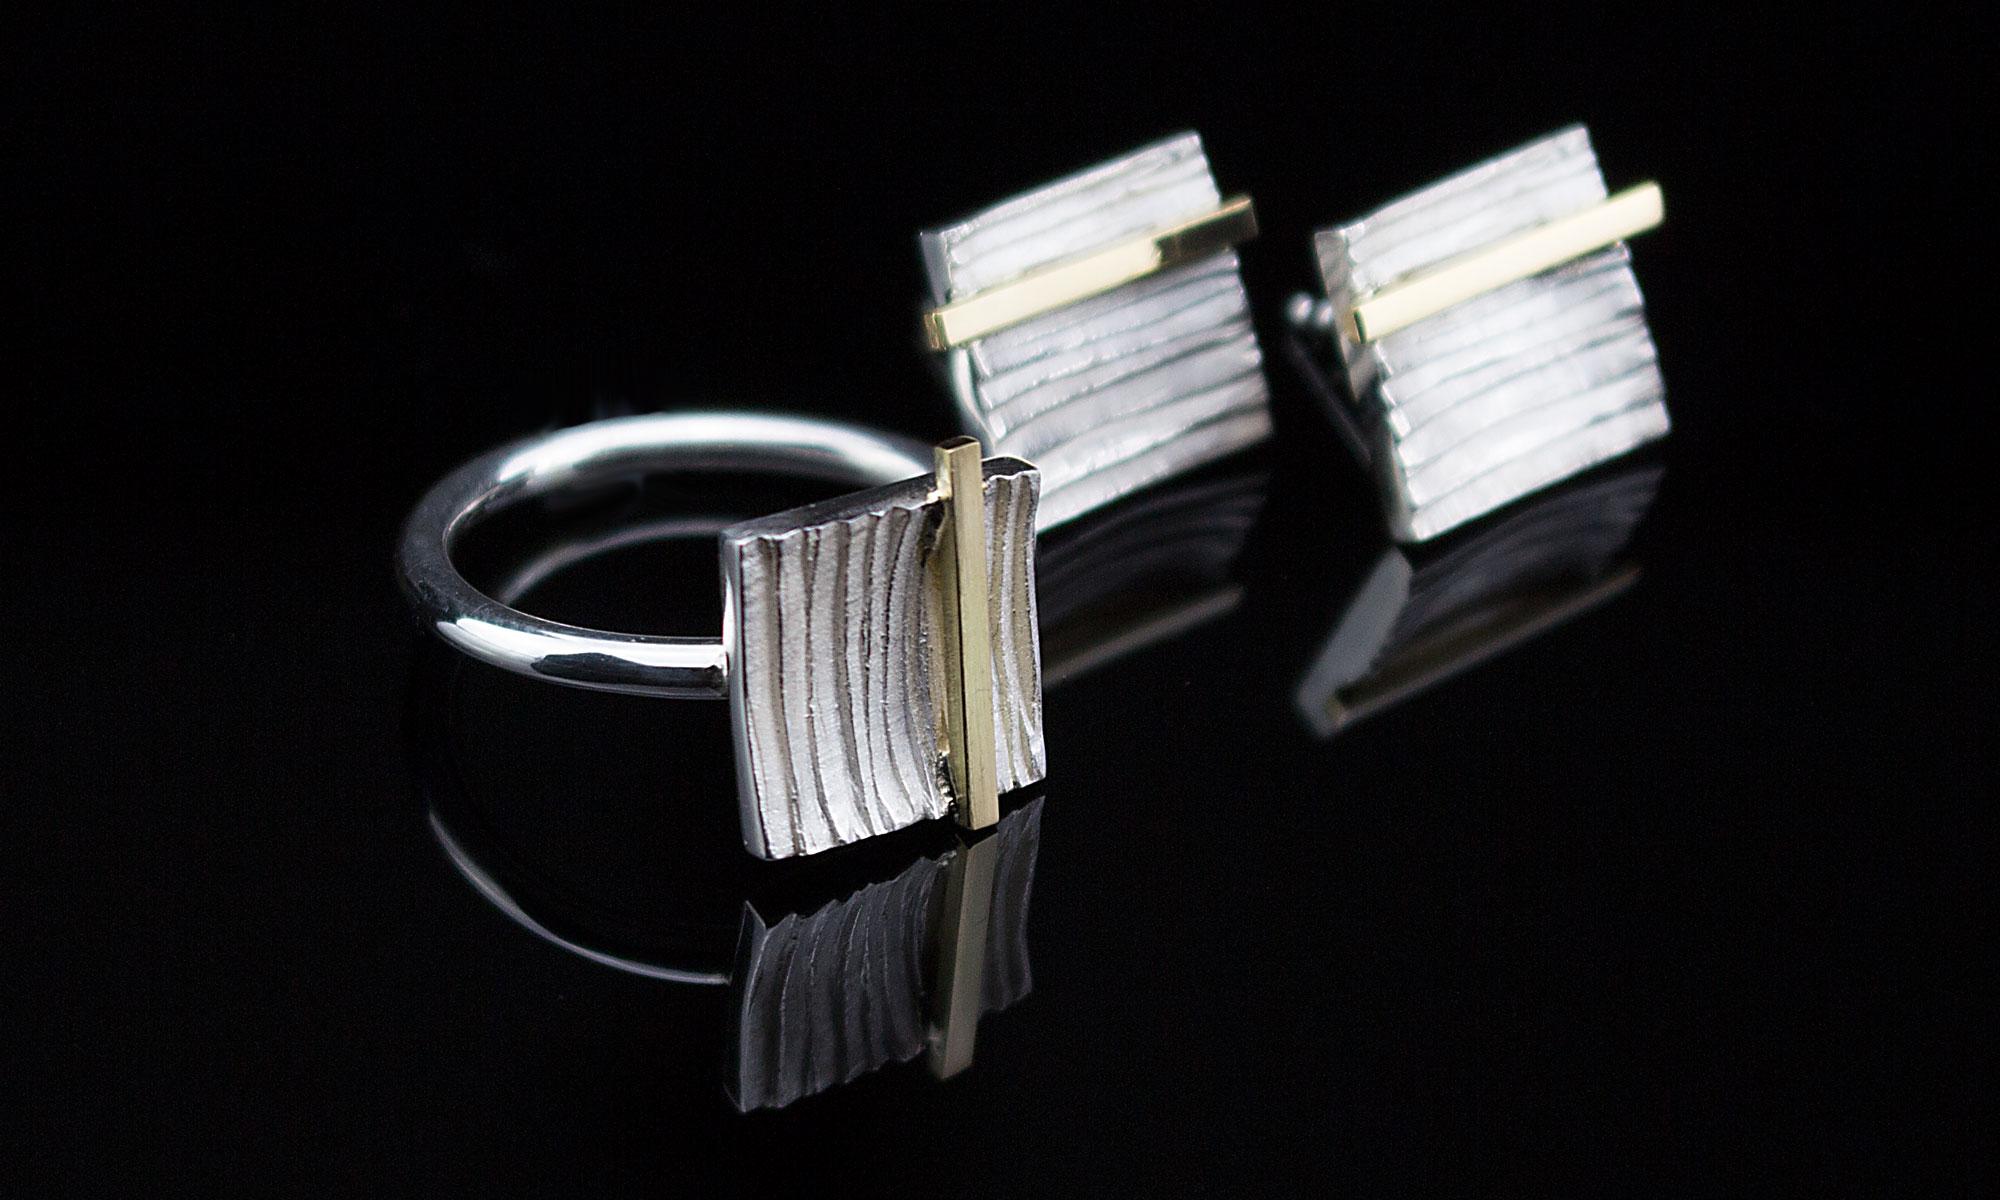 https://cmbayer.de/wp-content/uploads/2016/12/Gold-Silber-Garnitur-Ring.jpg